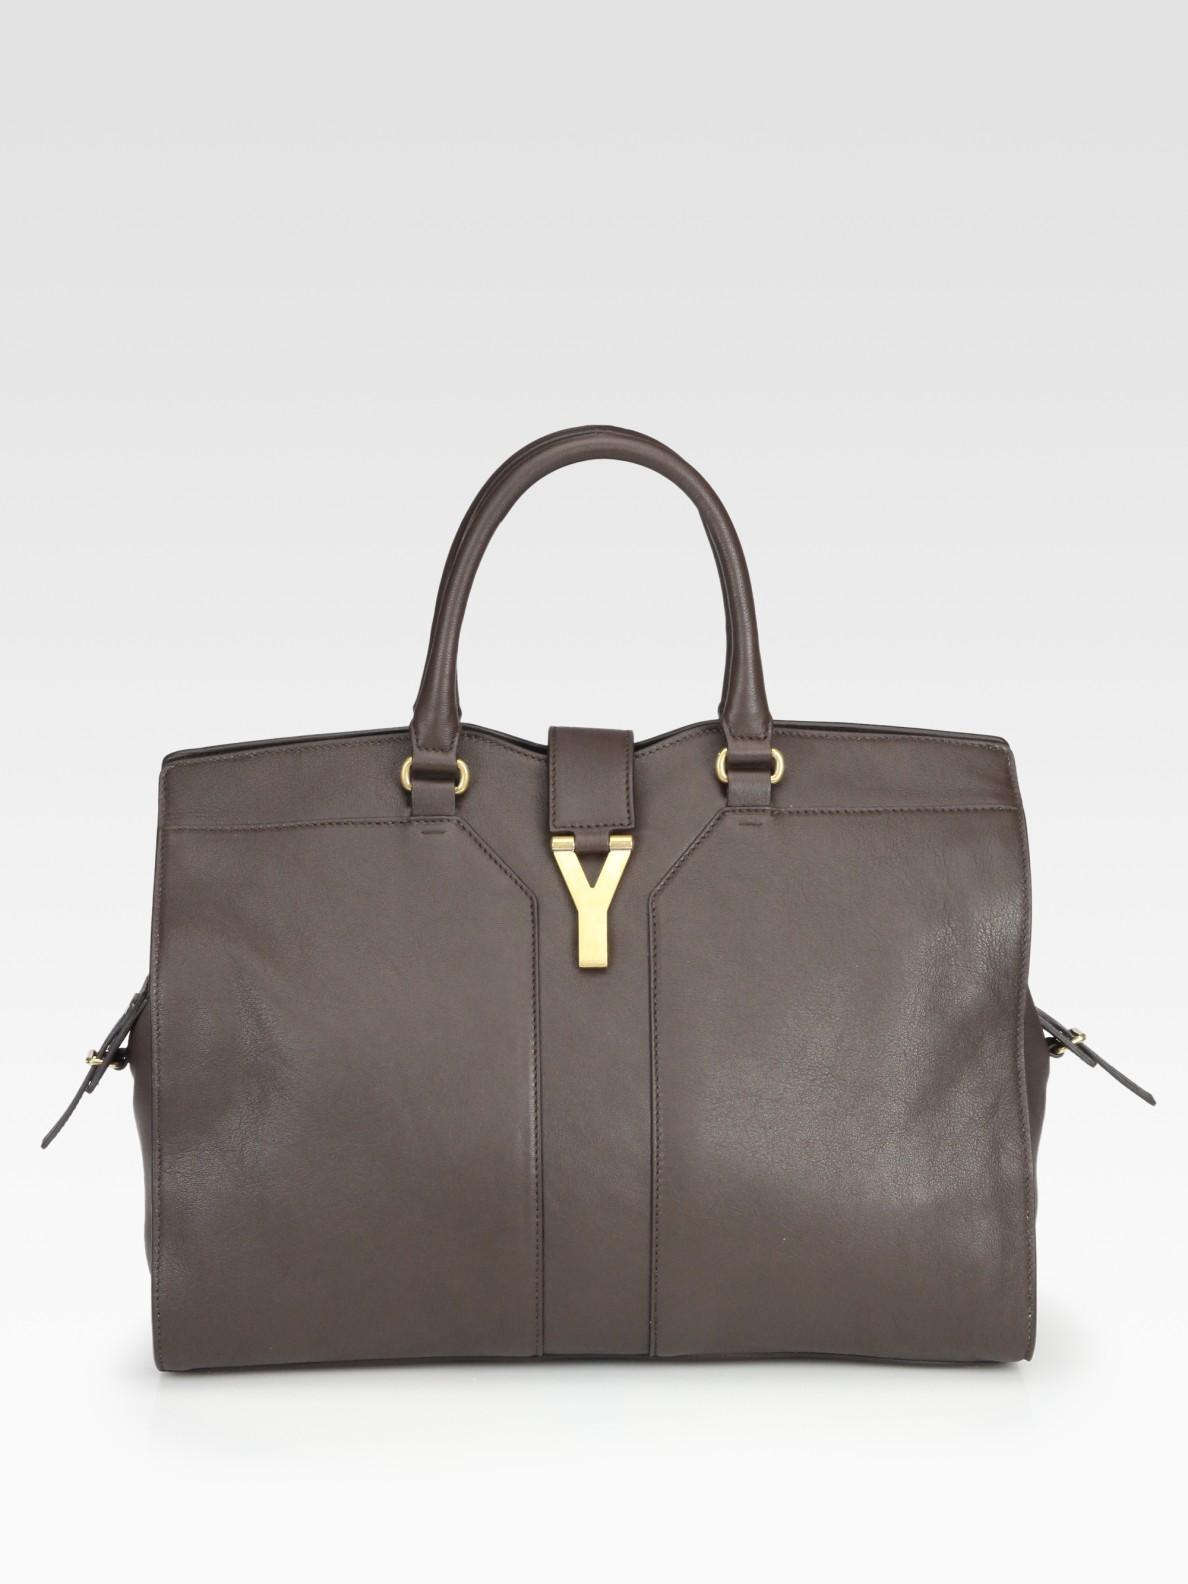 Lyst Saint Laurent Ysl Cabas Chyc Large Leather East